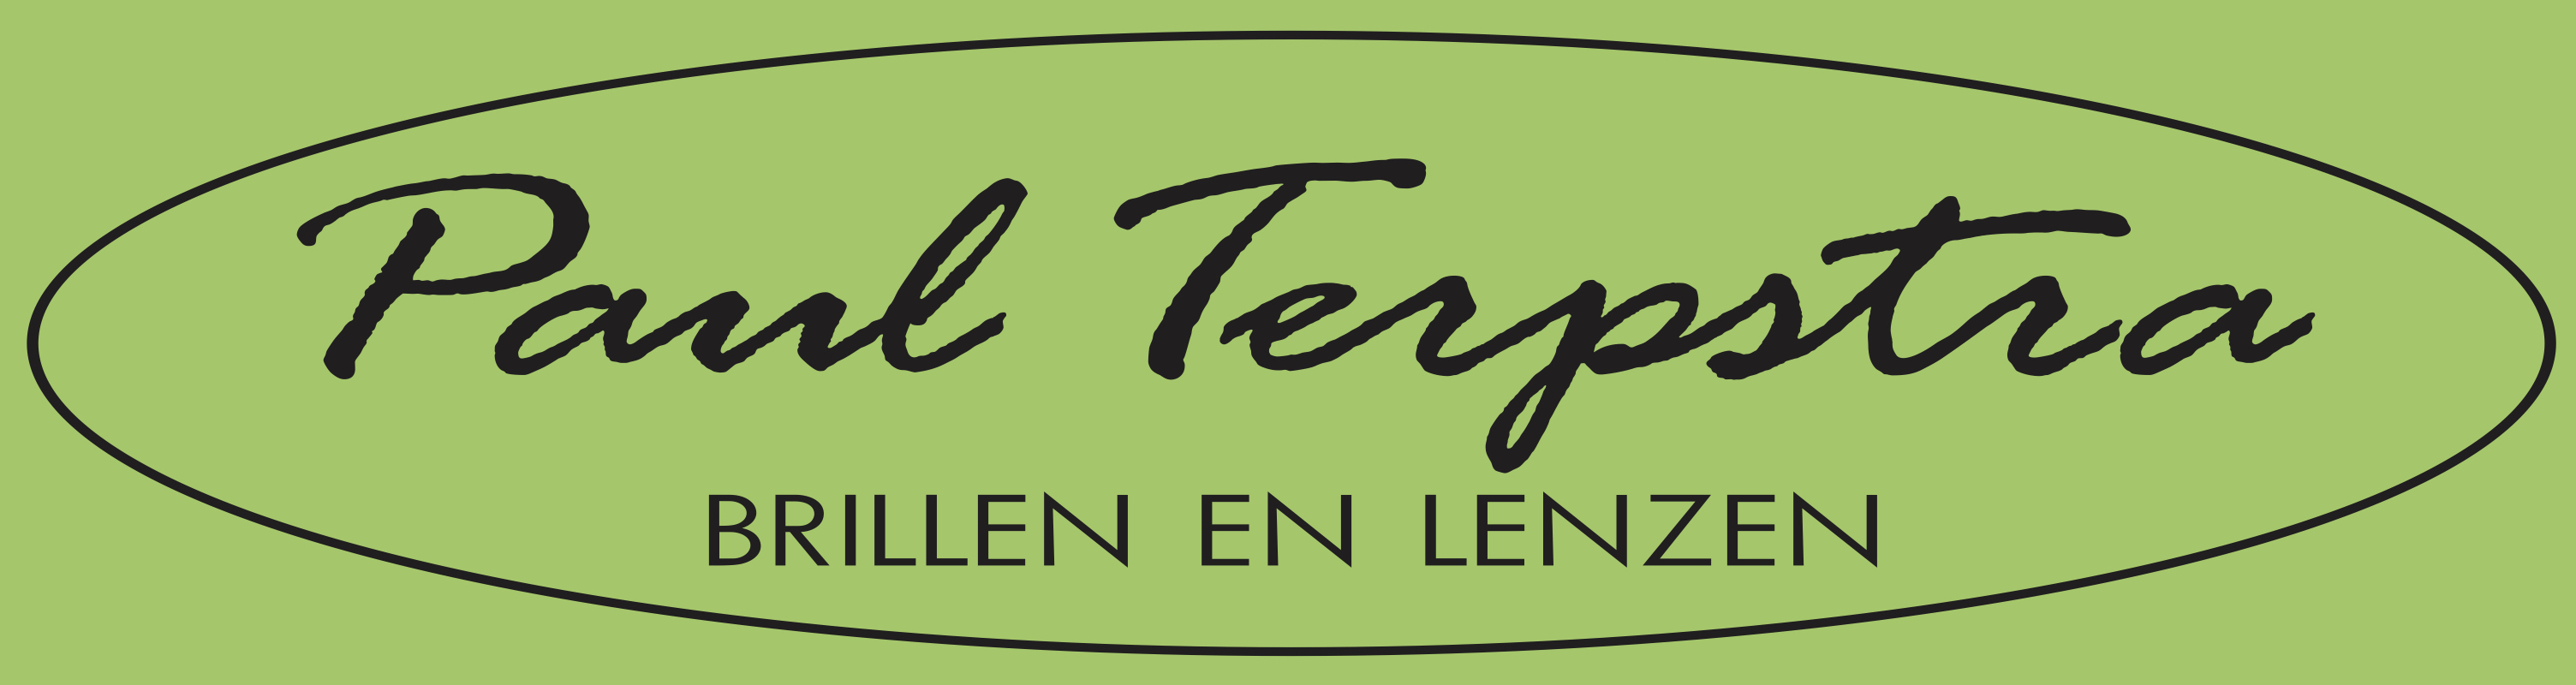 terpstra-logo (2)-4